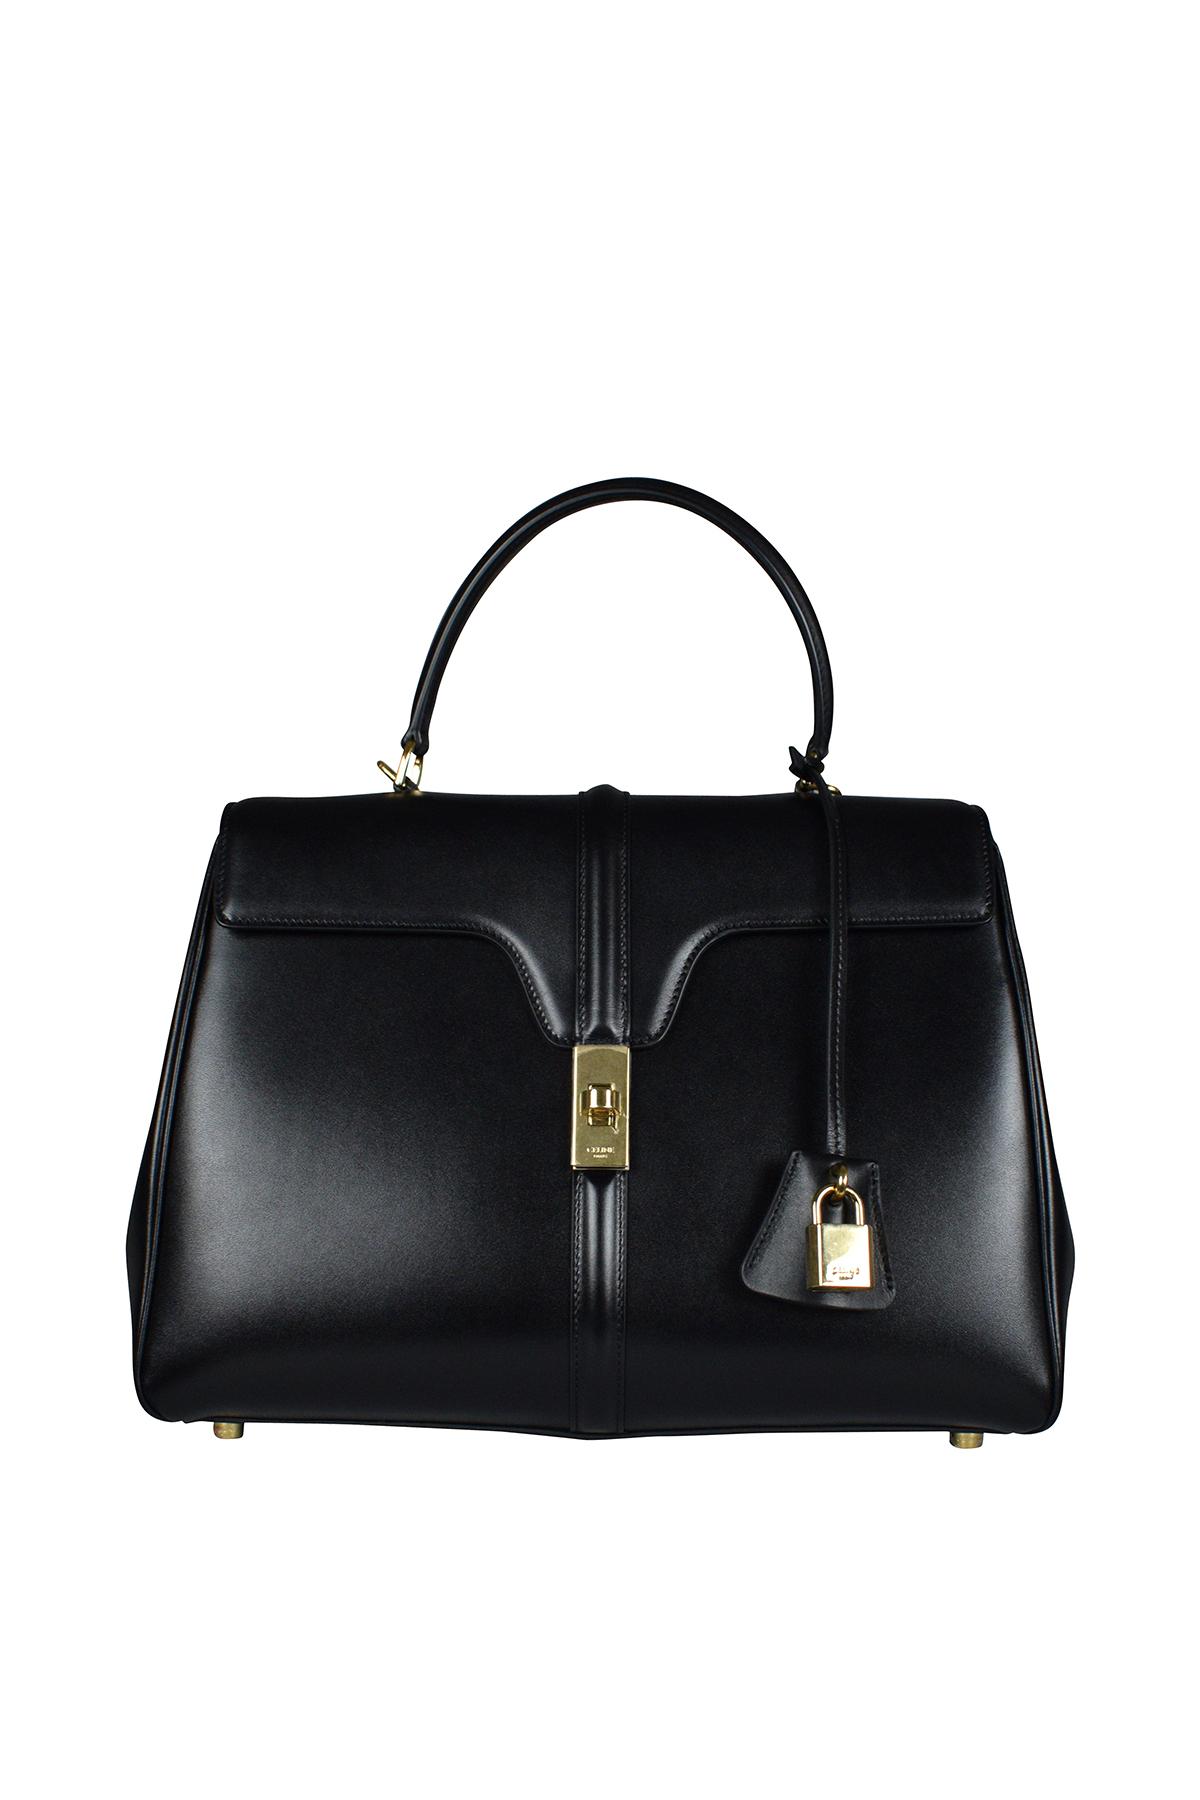 Celine 16 medium bag in black satin calfskin.